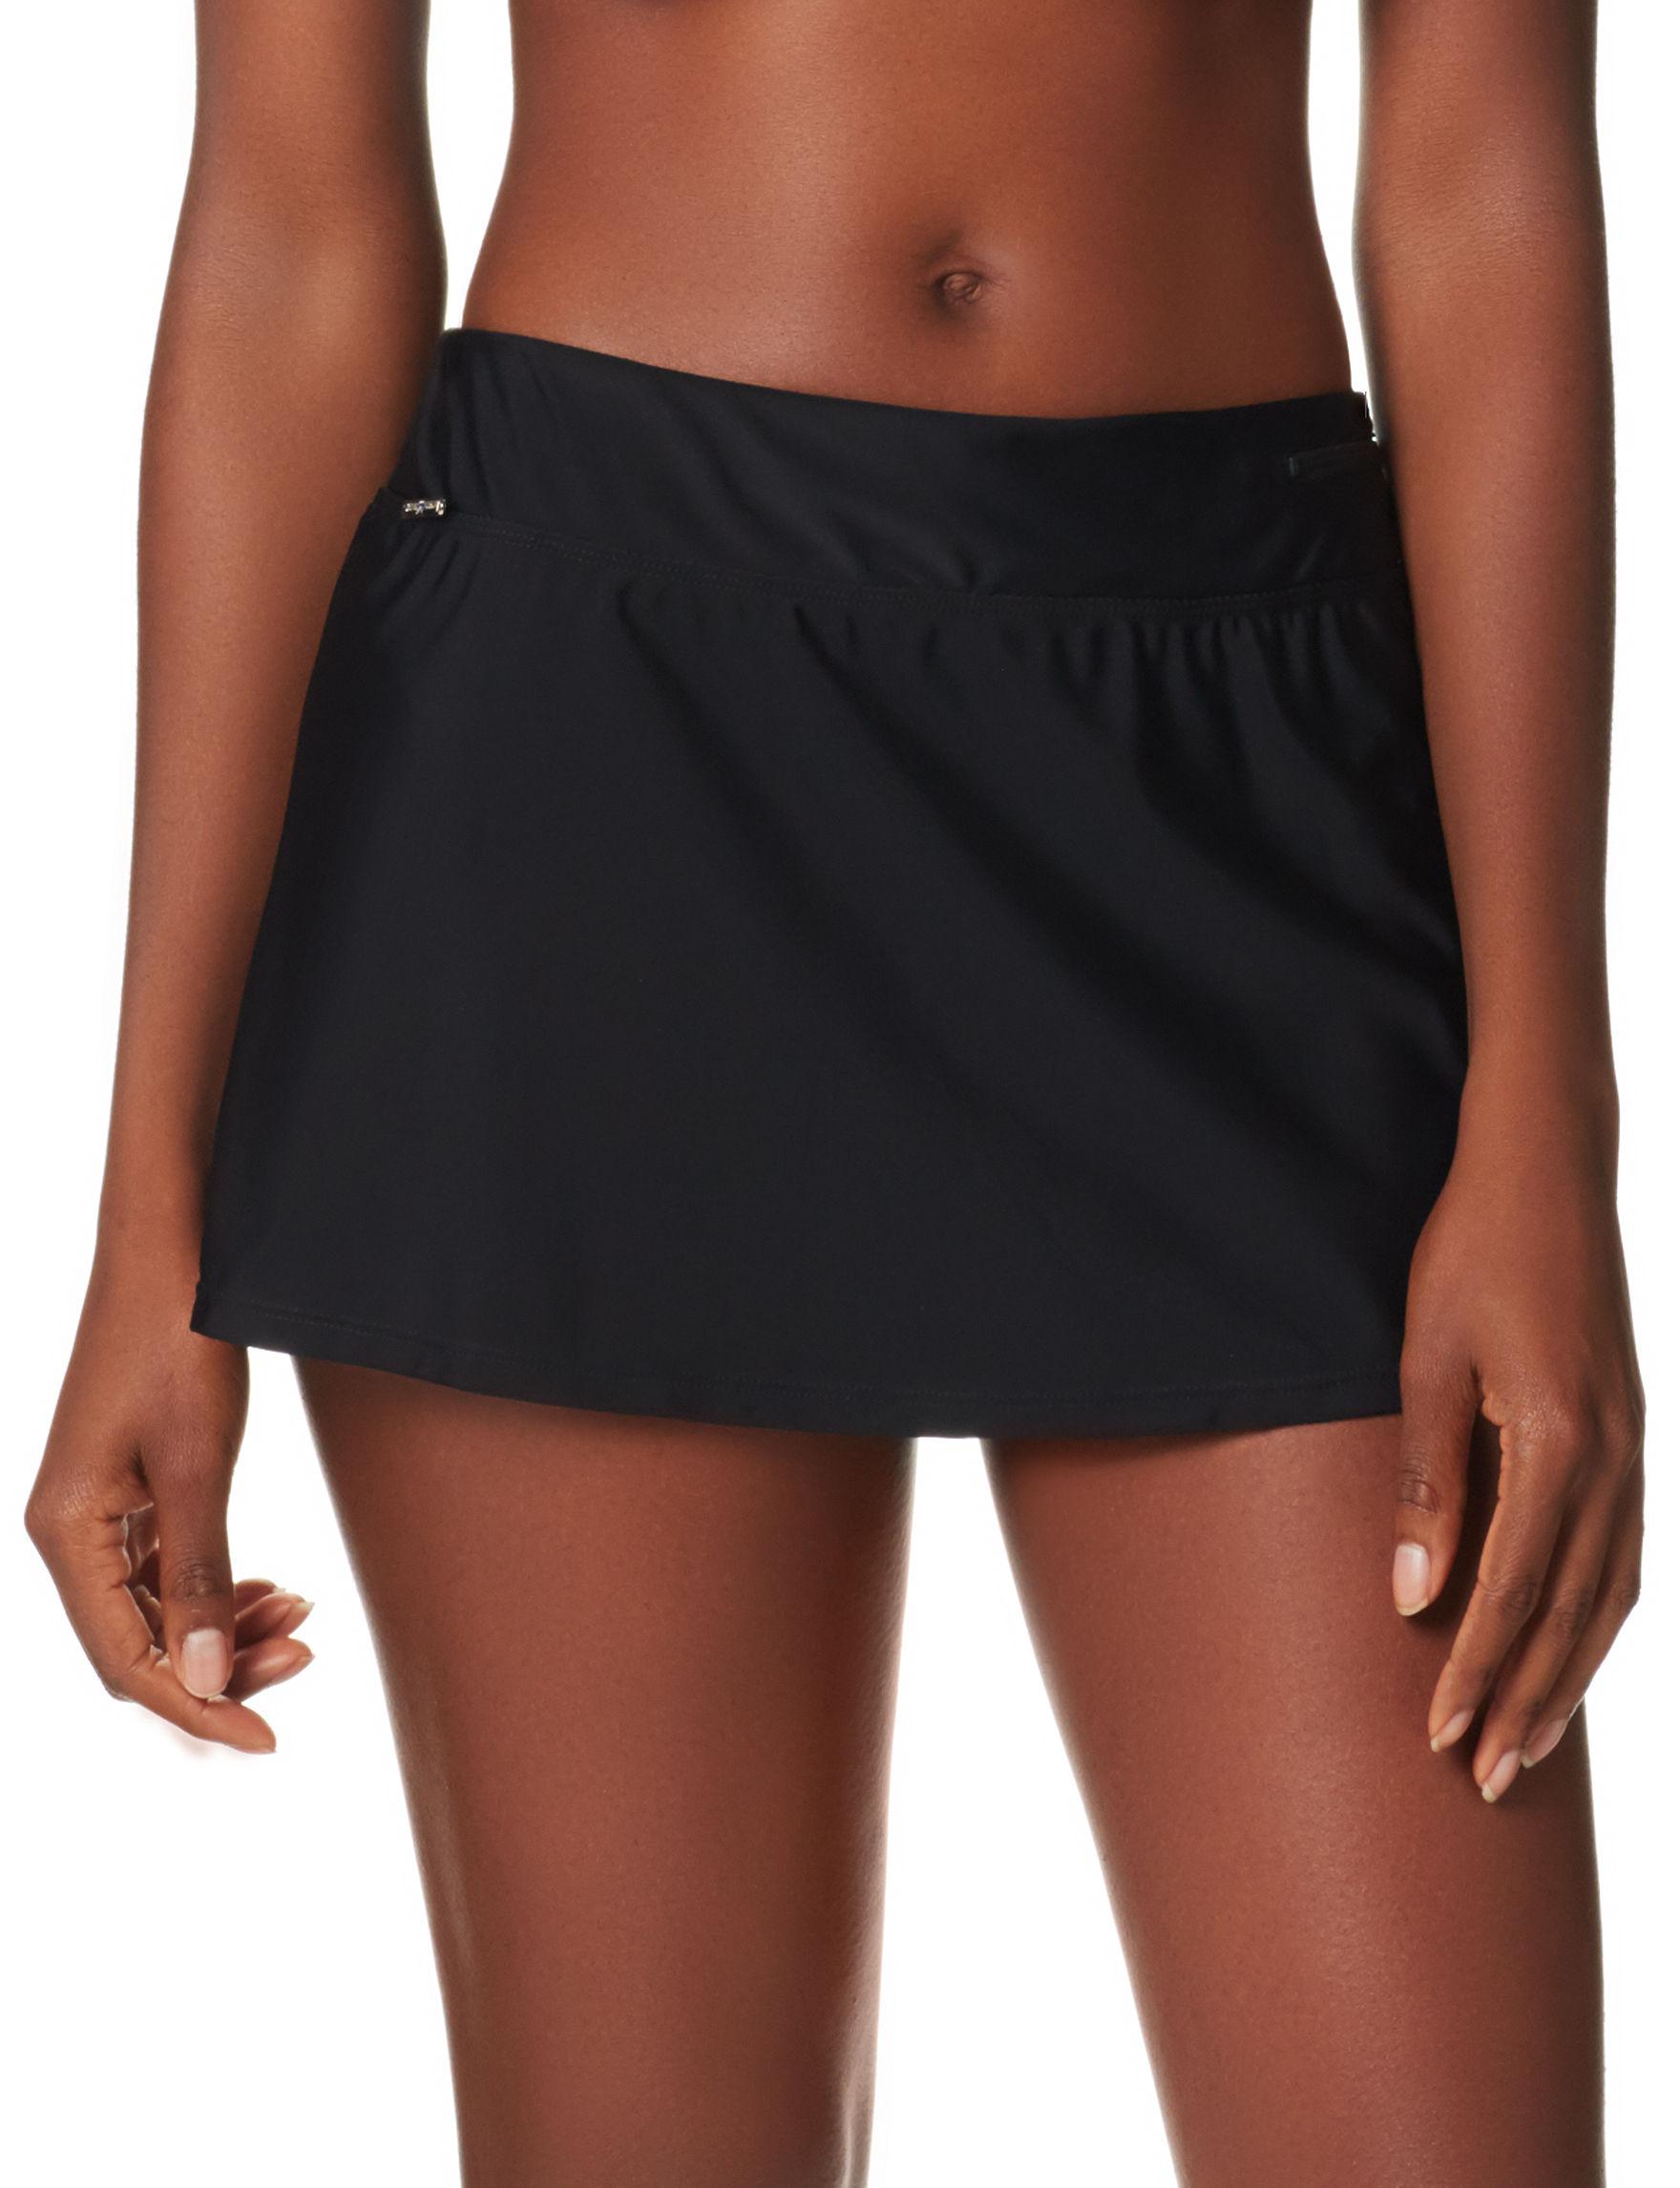 Zero Xposur Black Swimsuit Bottoms Skirtini